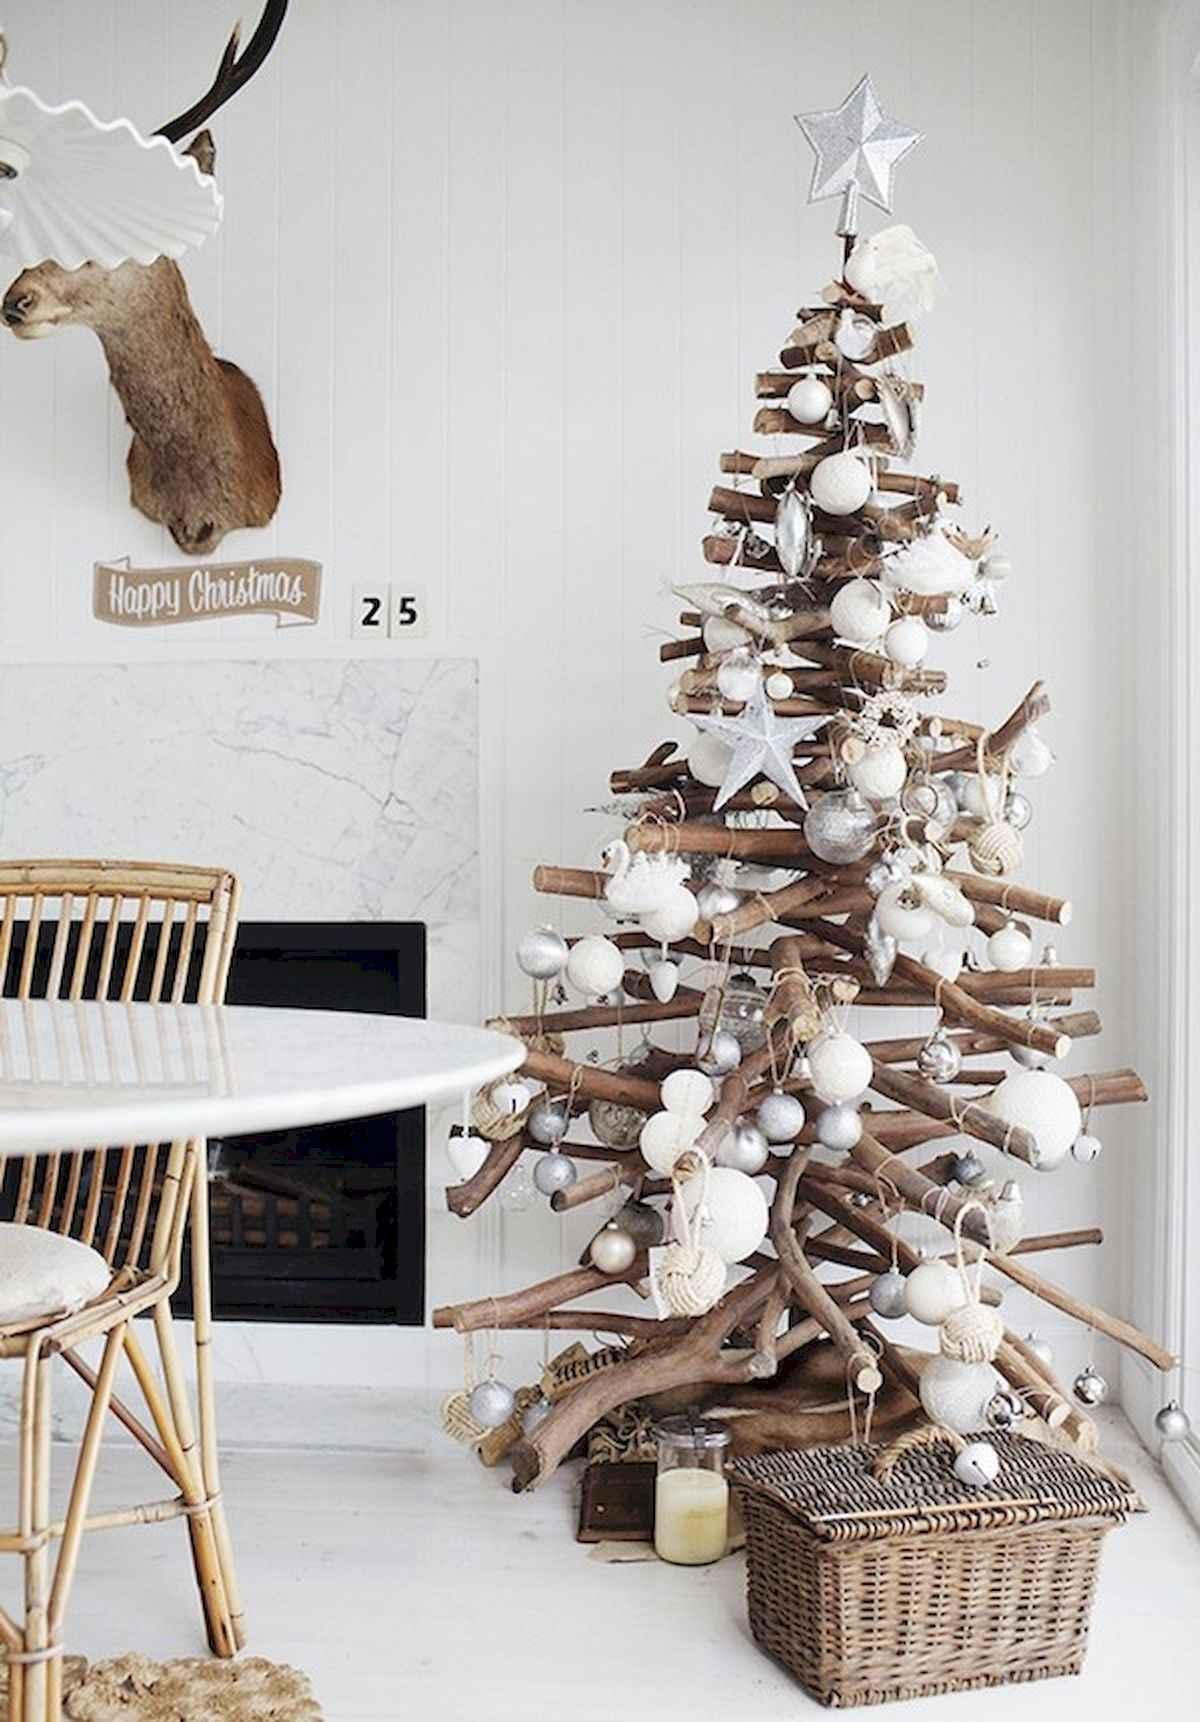 50 diy christmas decorations ideas (26)